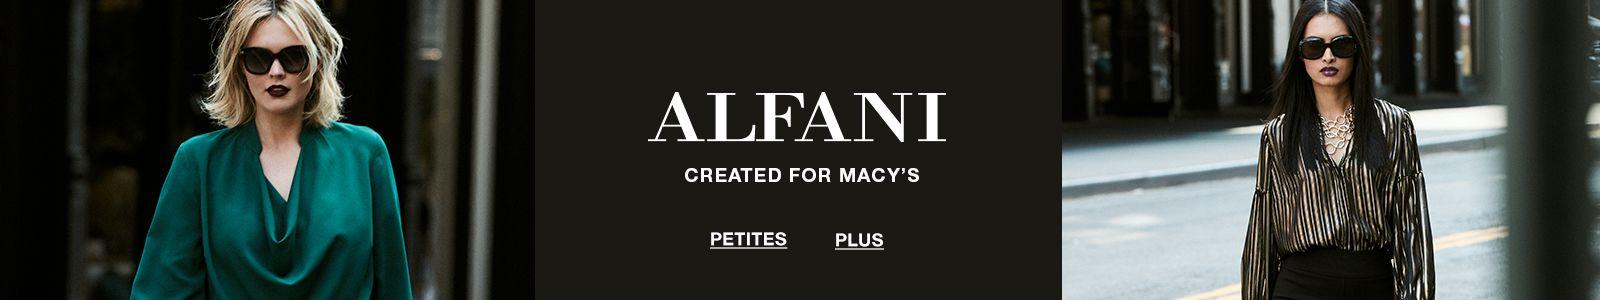 Alfani, Created For Macy's, Petites, Plus